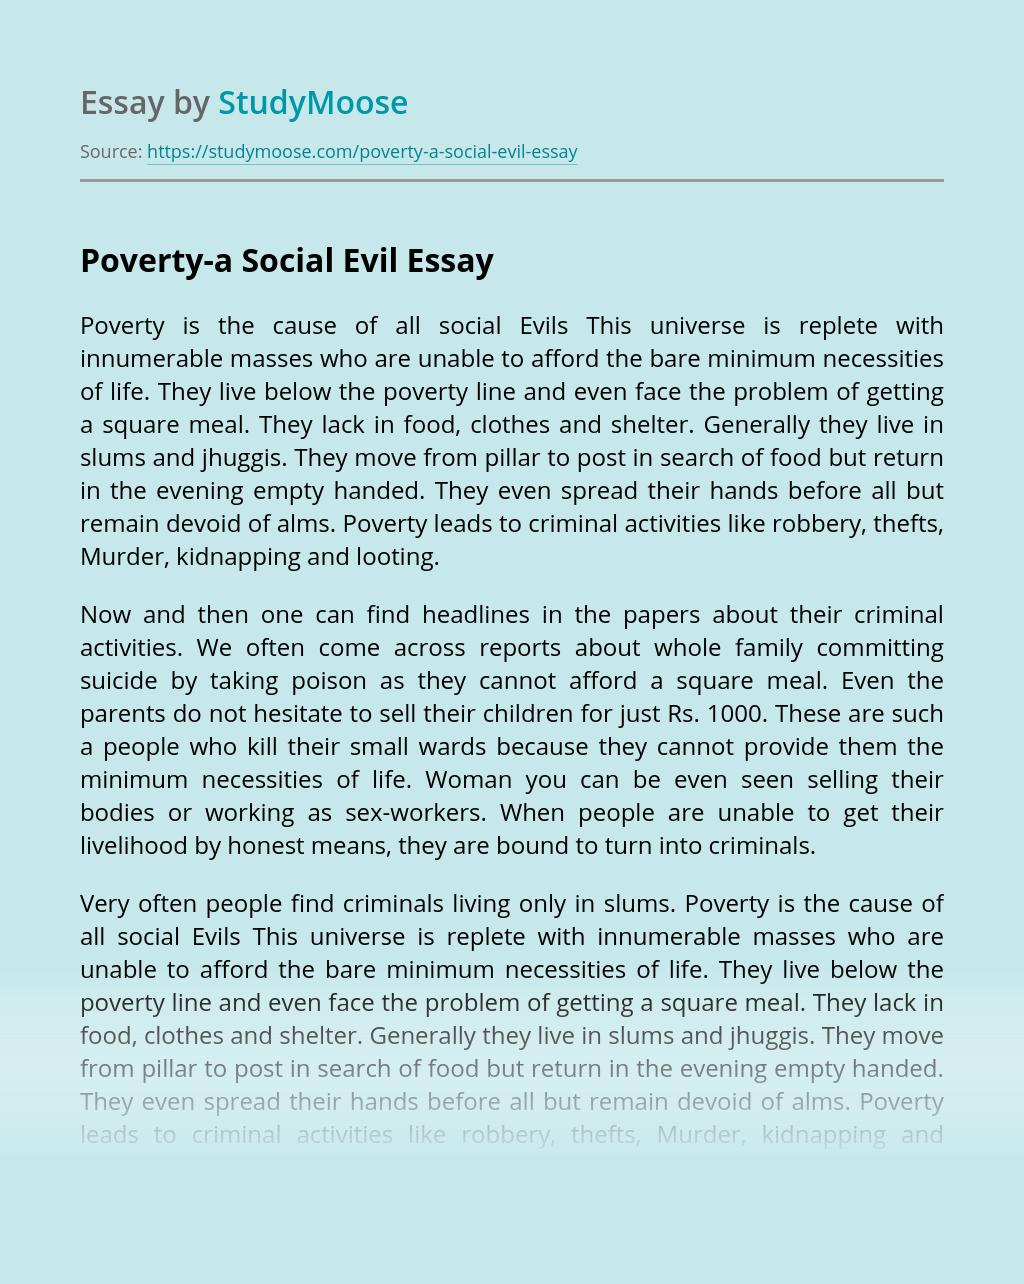 Poverty-a Social Evil